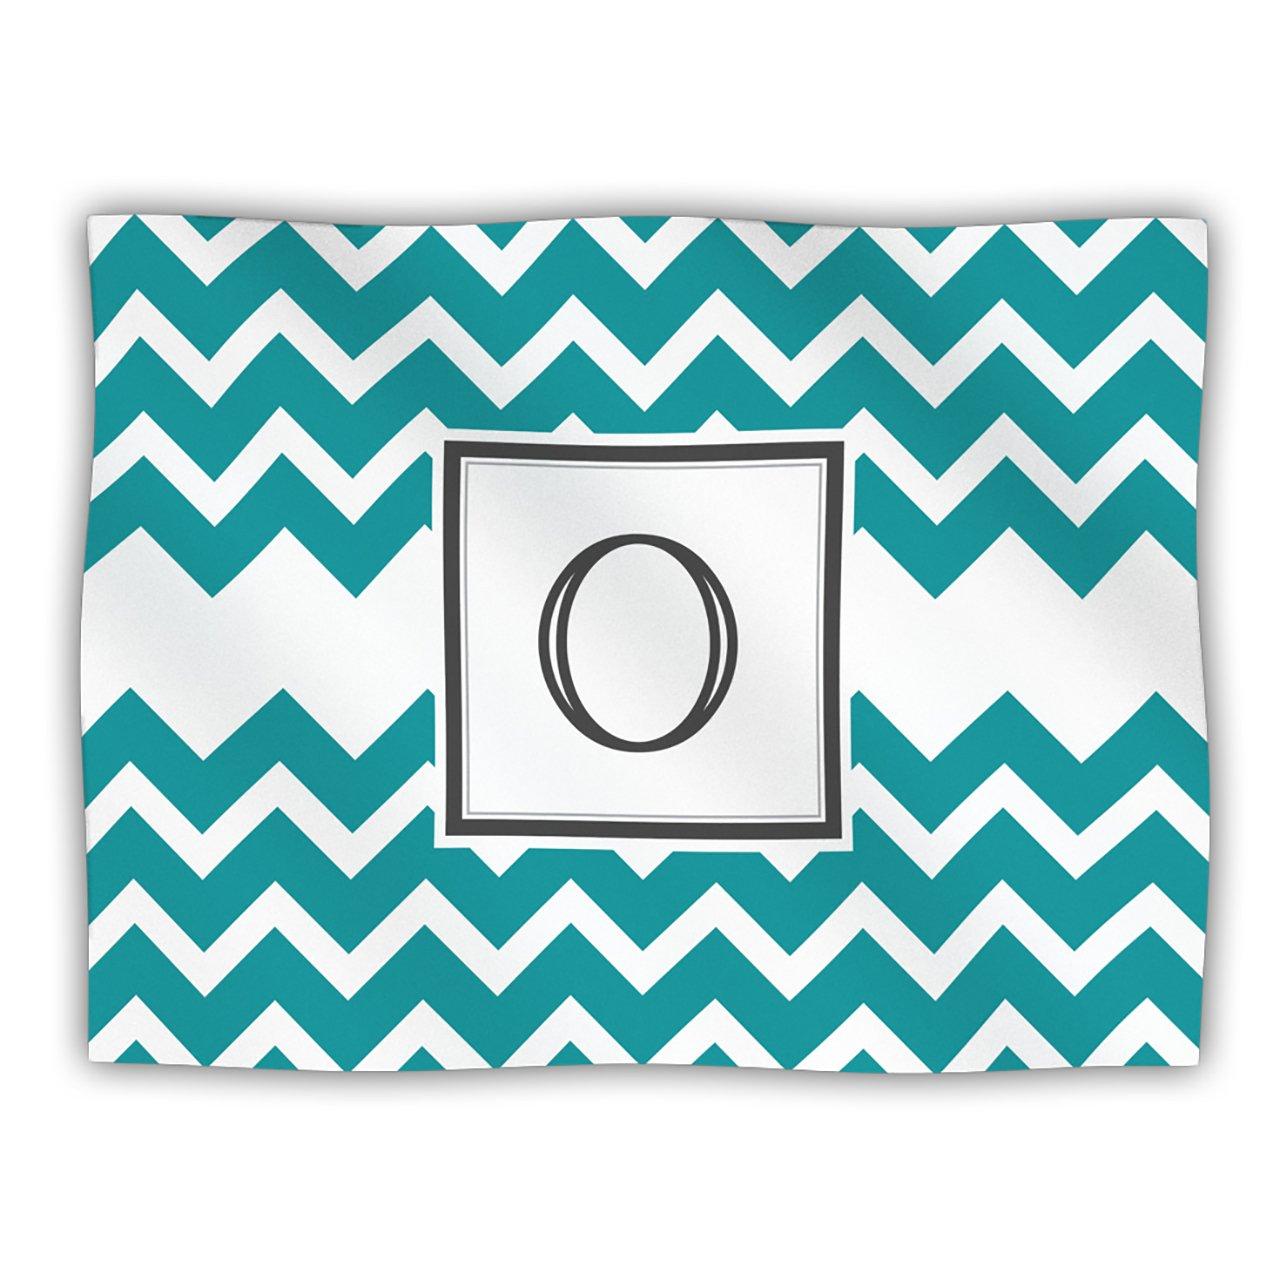 Kess InHouse Kess Original 'Monogram Chevron Teal Letter O' Dog Blanket, 40 by 30-Inch